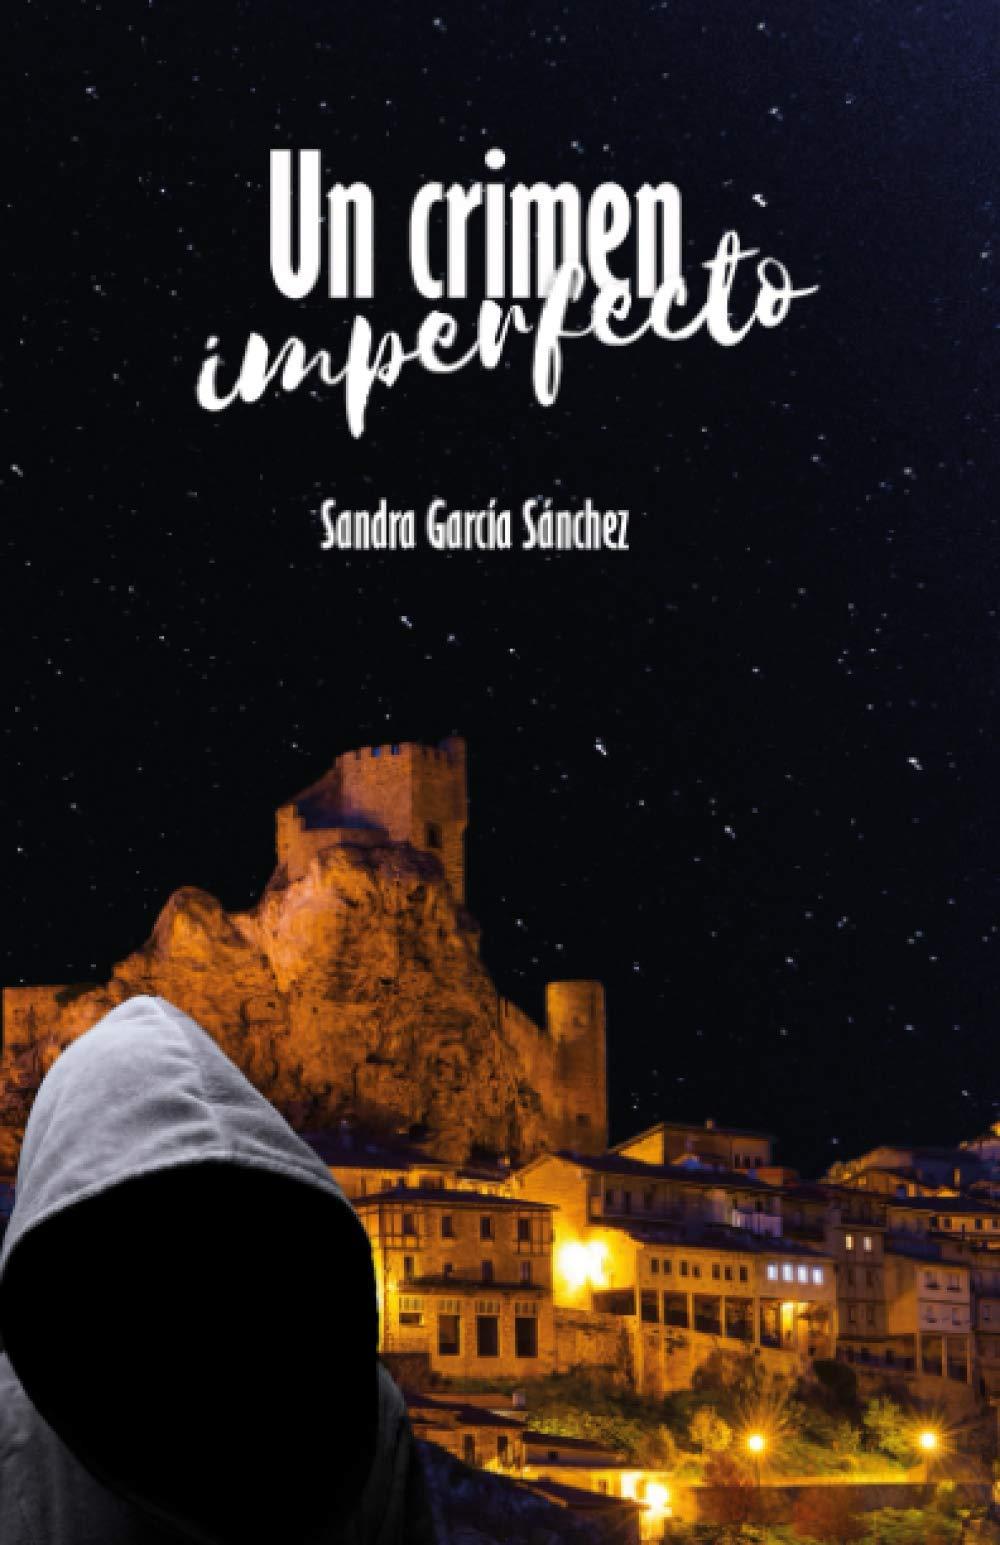 Un crimen imperfecto